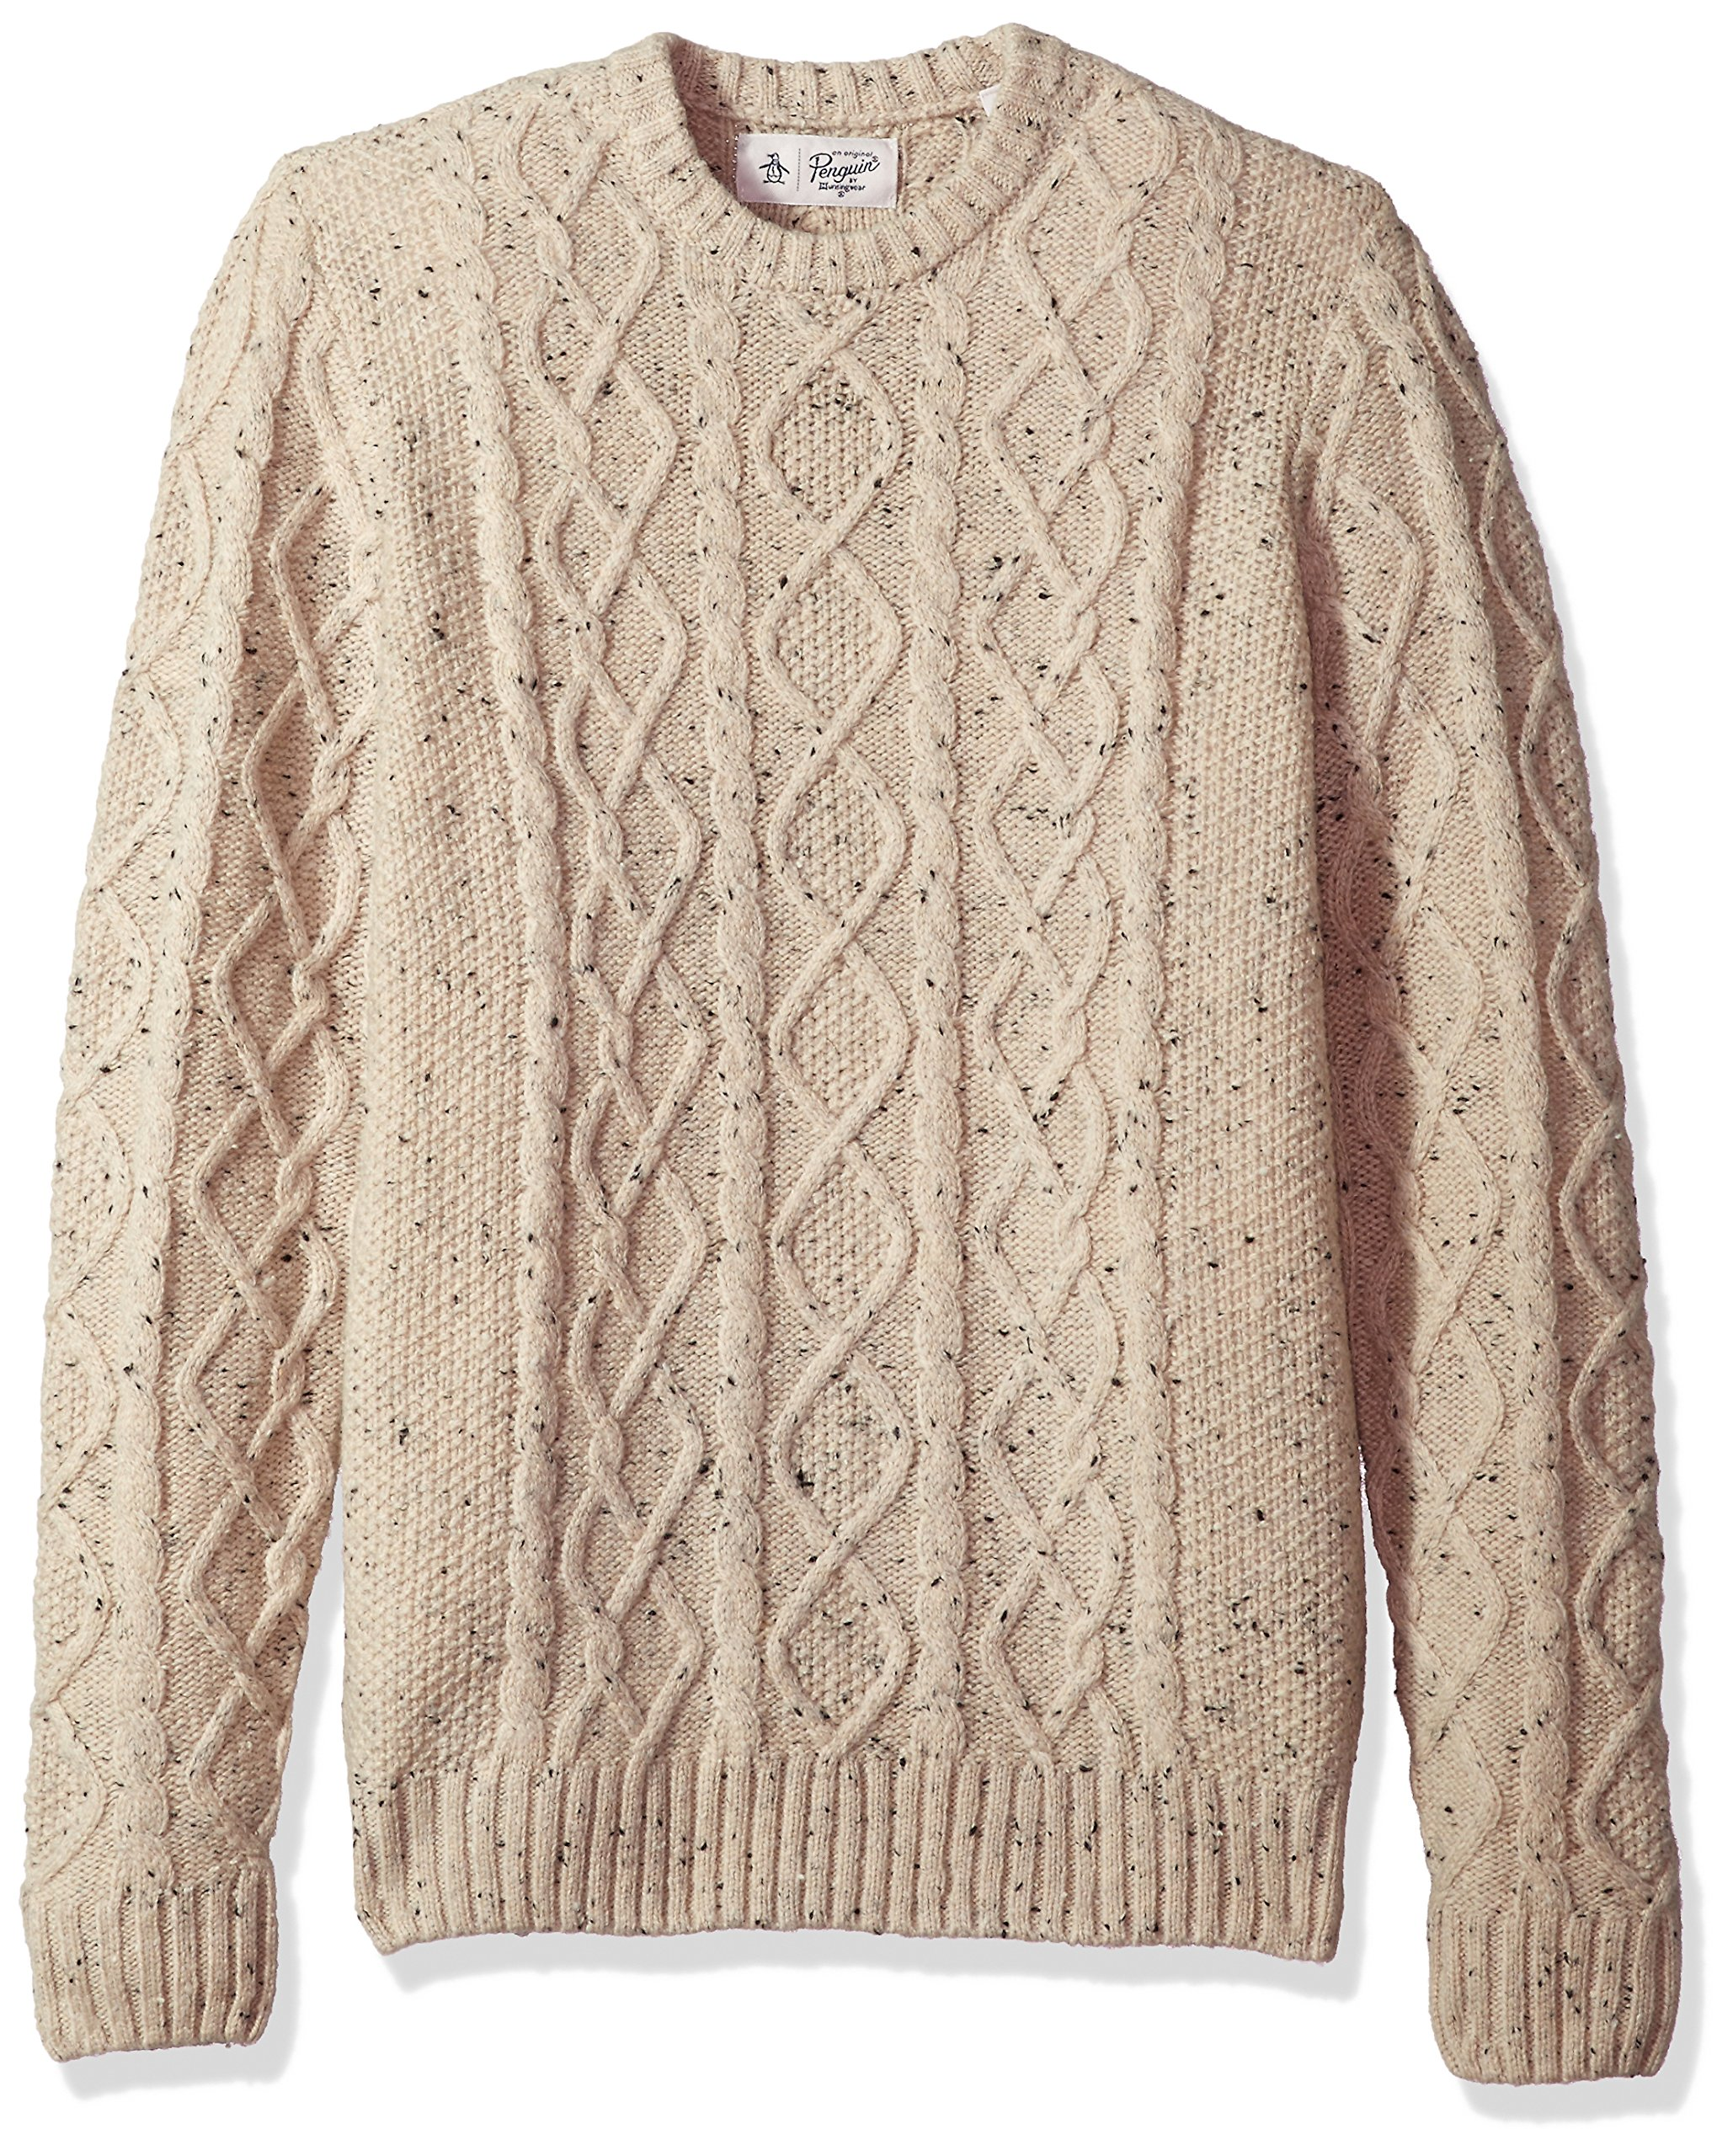 Original Penguin Men's Wool Alpaca Crew Sweater, Oatmeal, Medium